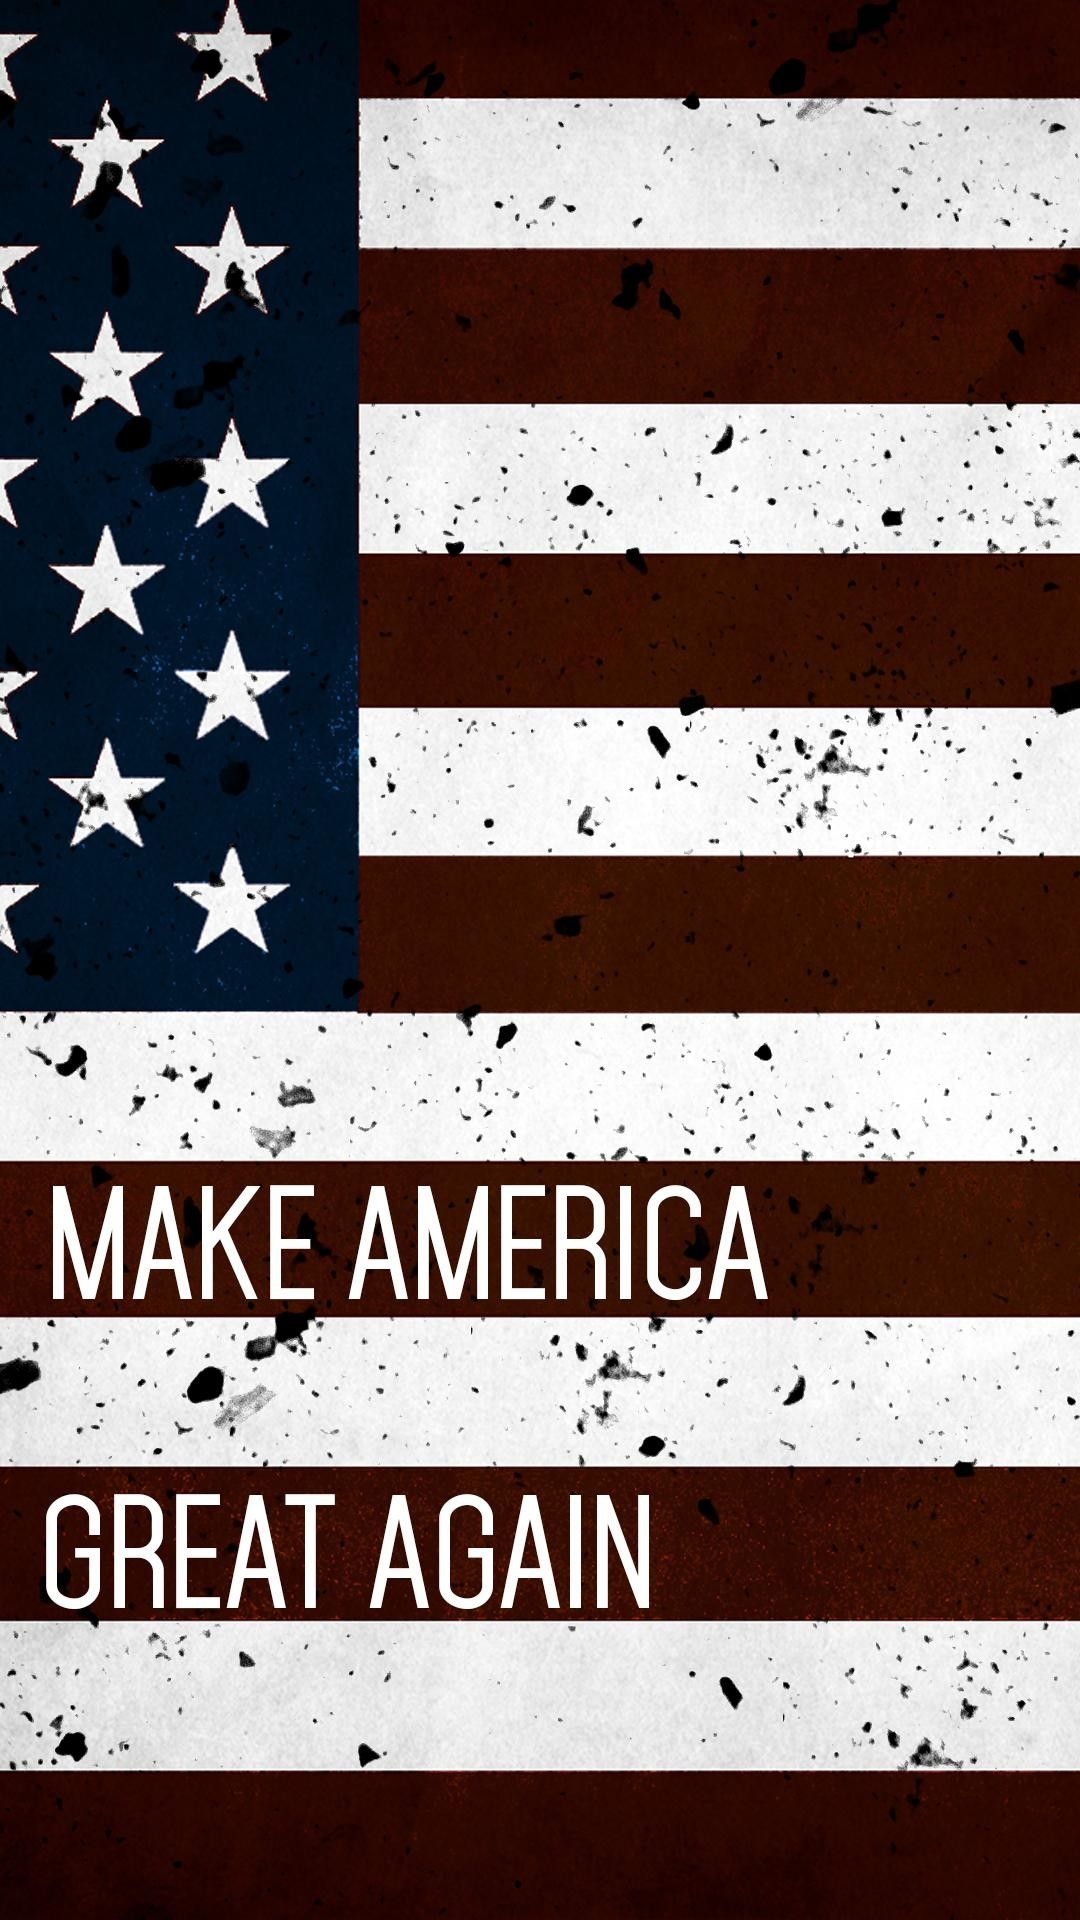 1080x1920 Patriotic HD wallpaper for iPhone American flag 1080x1920